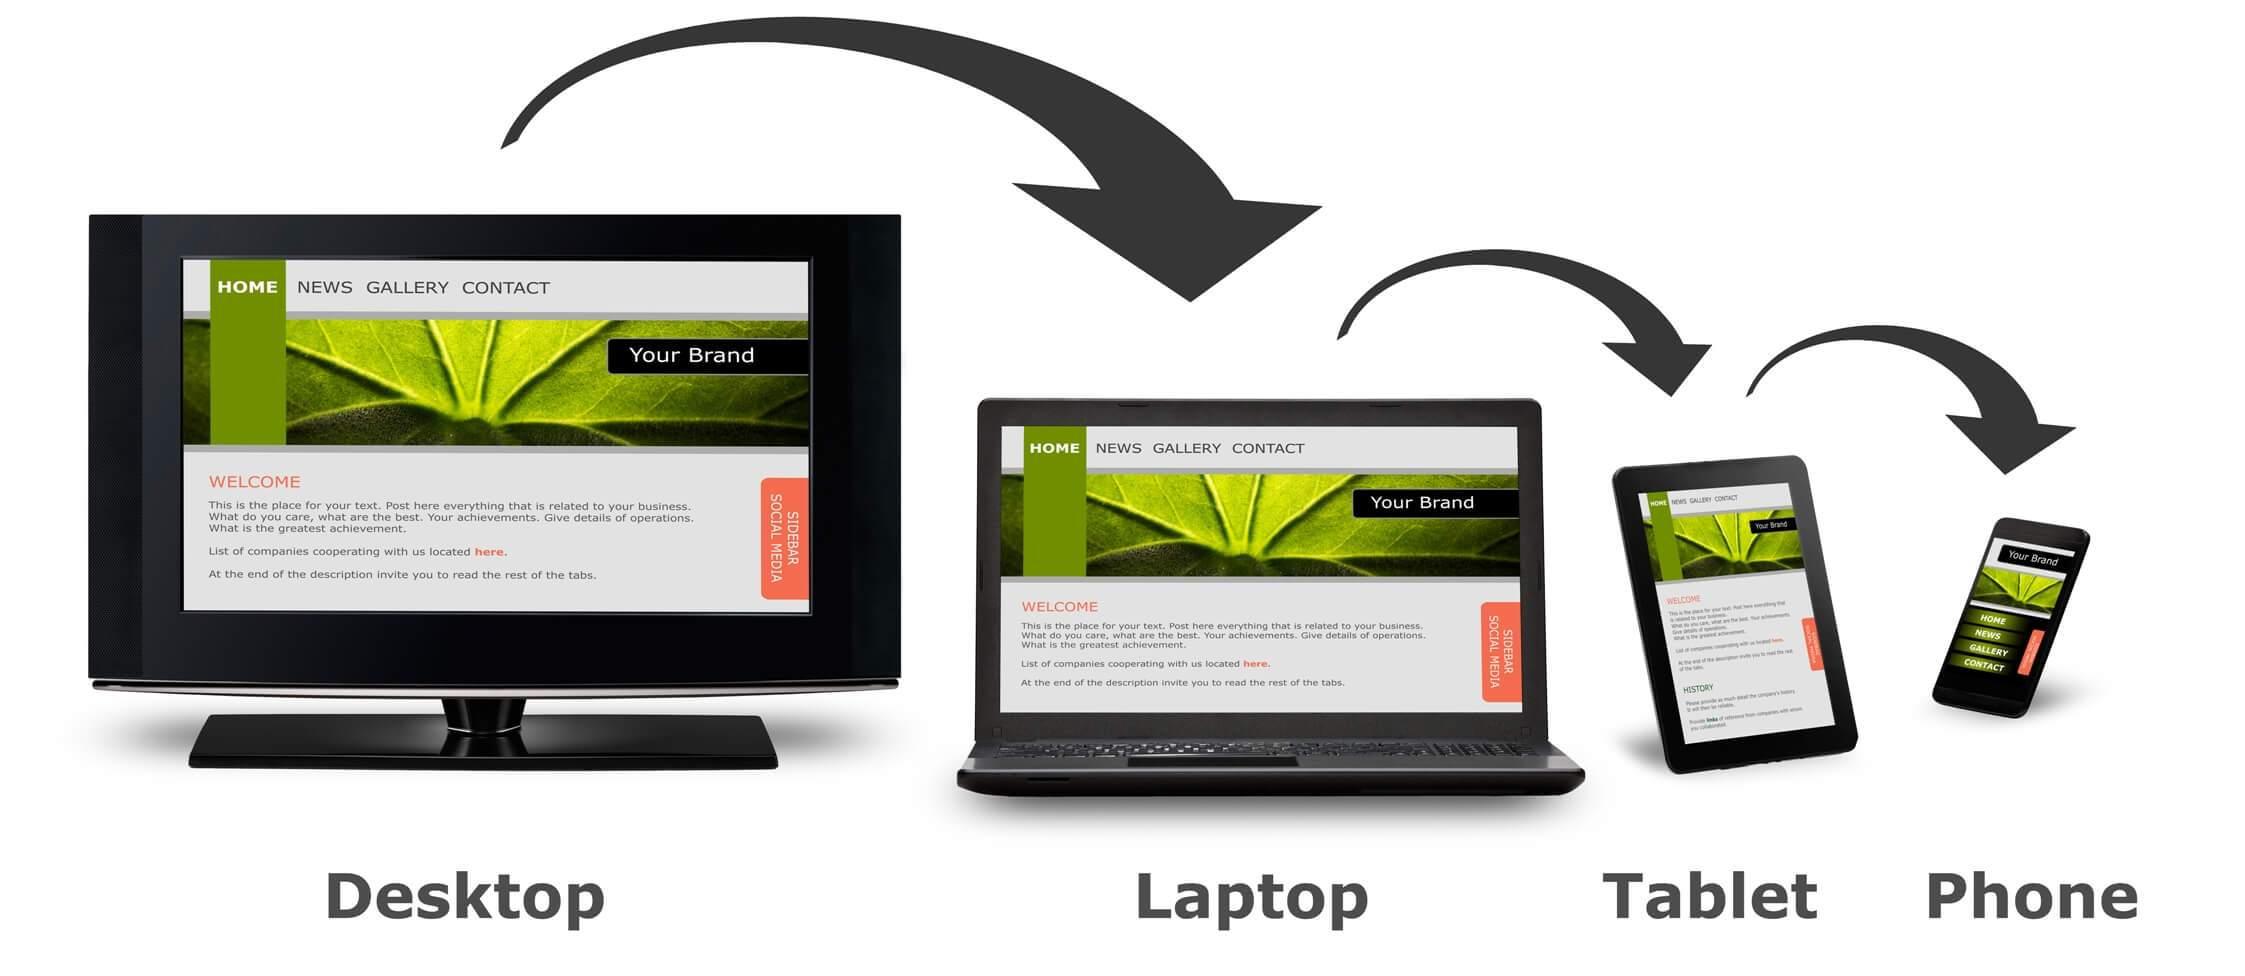 responsive-website-design-green-dreams-time-2245-x-976